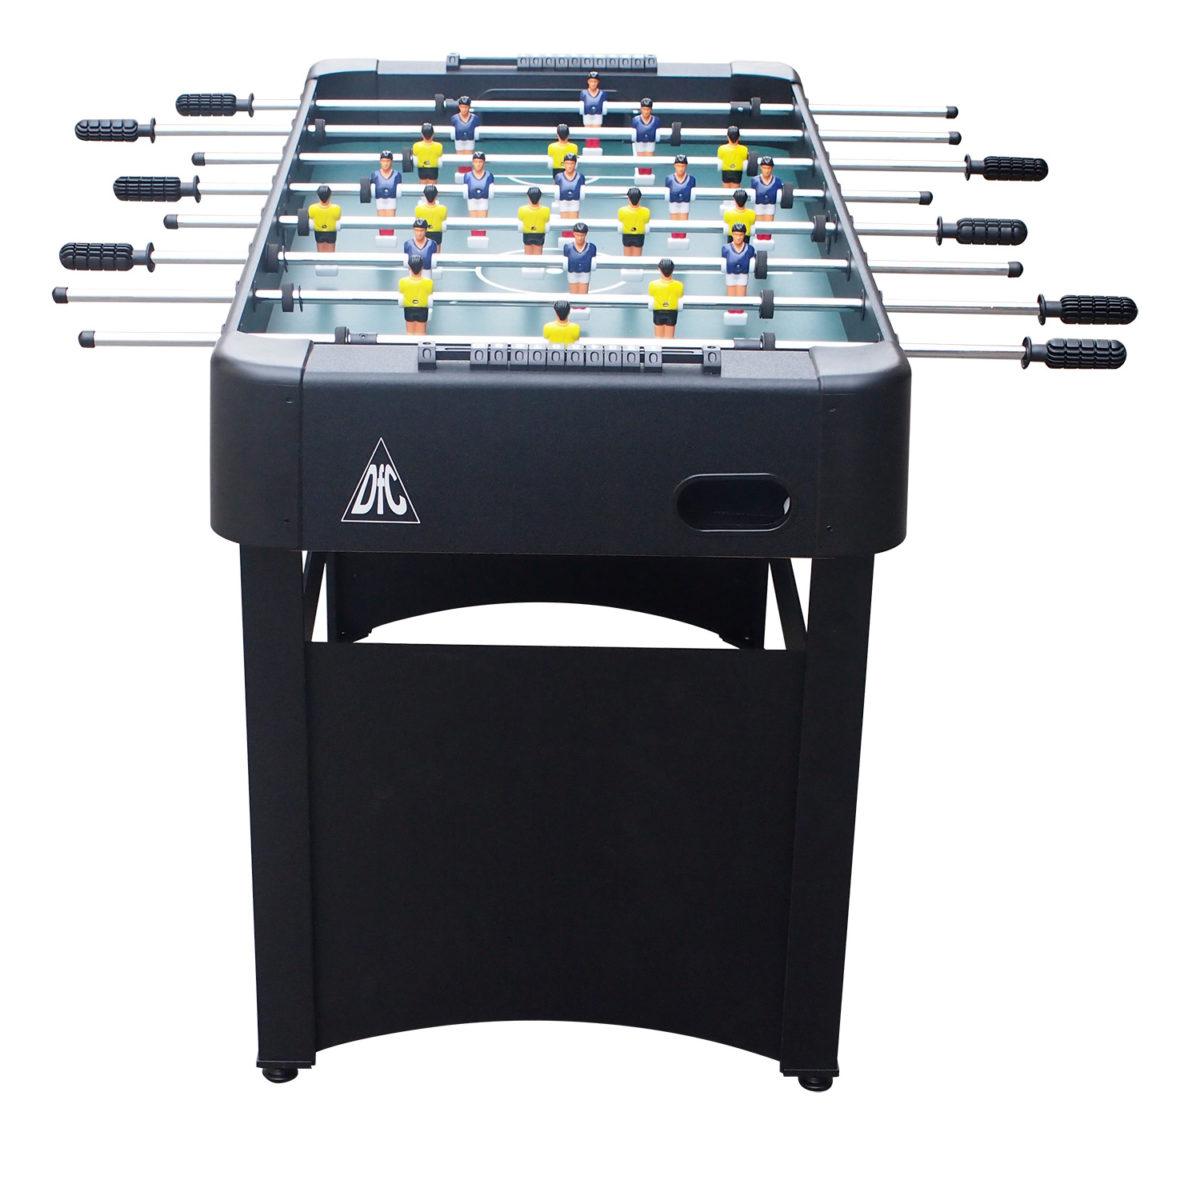 DFC TOTTENHAM Игровой стол футбол  ES-ST-3011 - 3